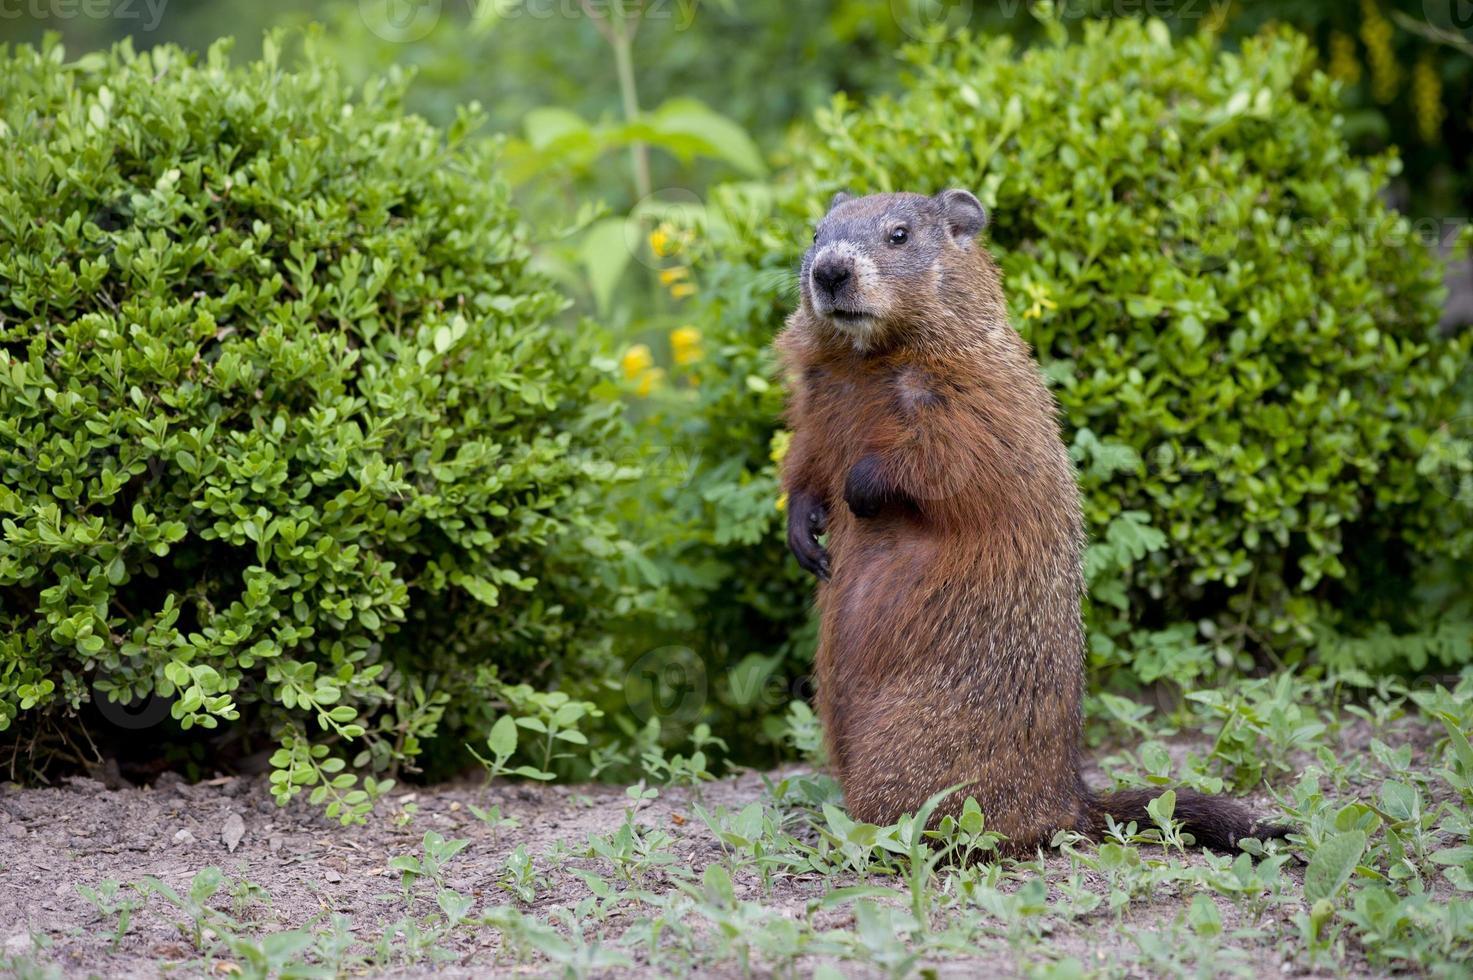 jonge groundhog pup, ook wel bosmarmot genoemd foto